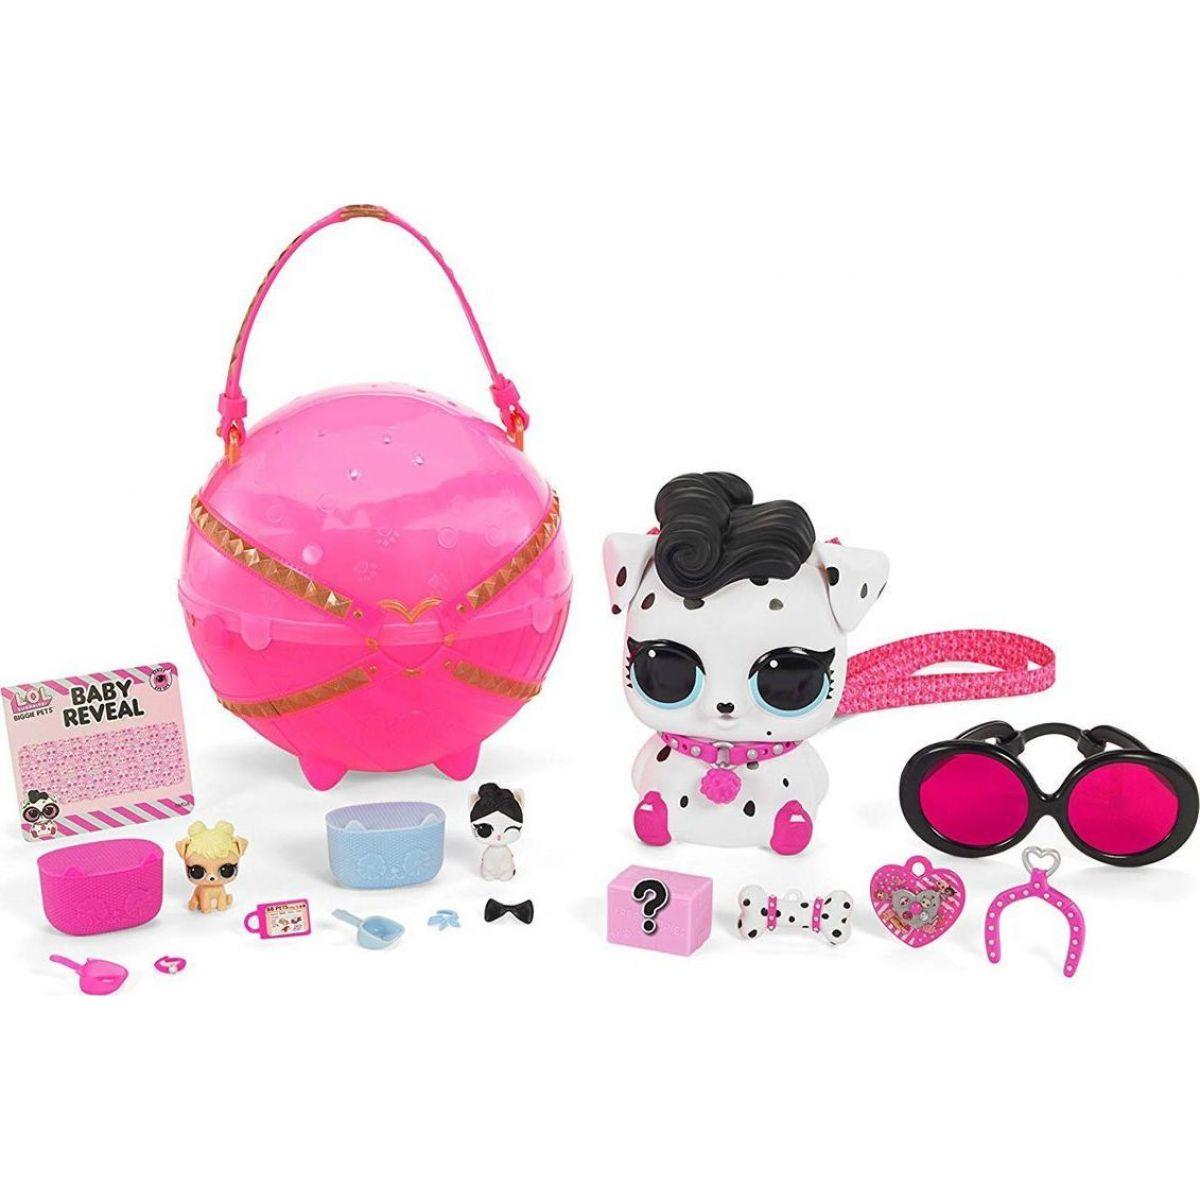 LOL Surprise Biggie Veľká zvieratká - ružové Dalmatín